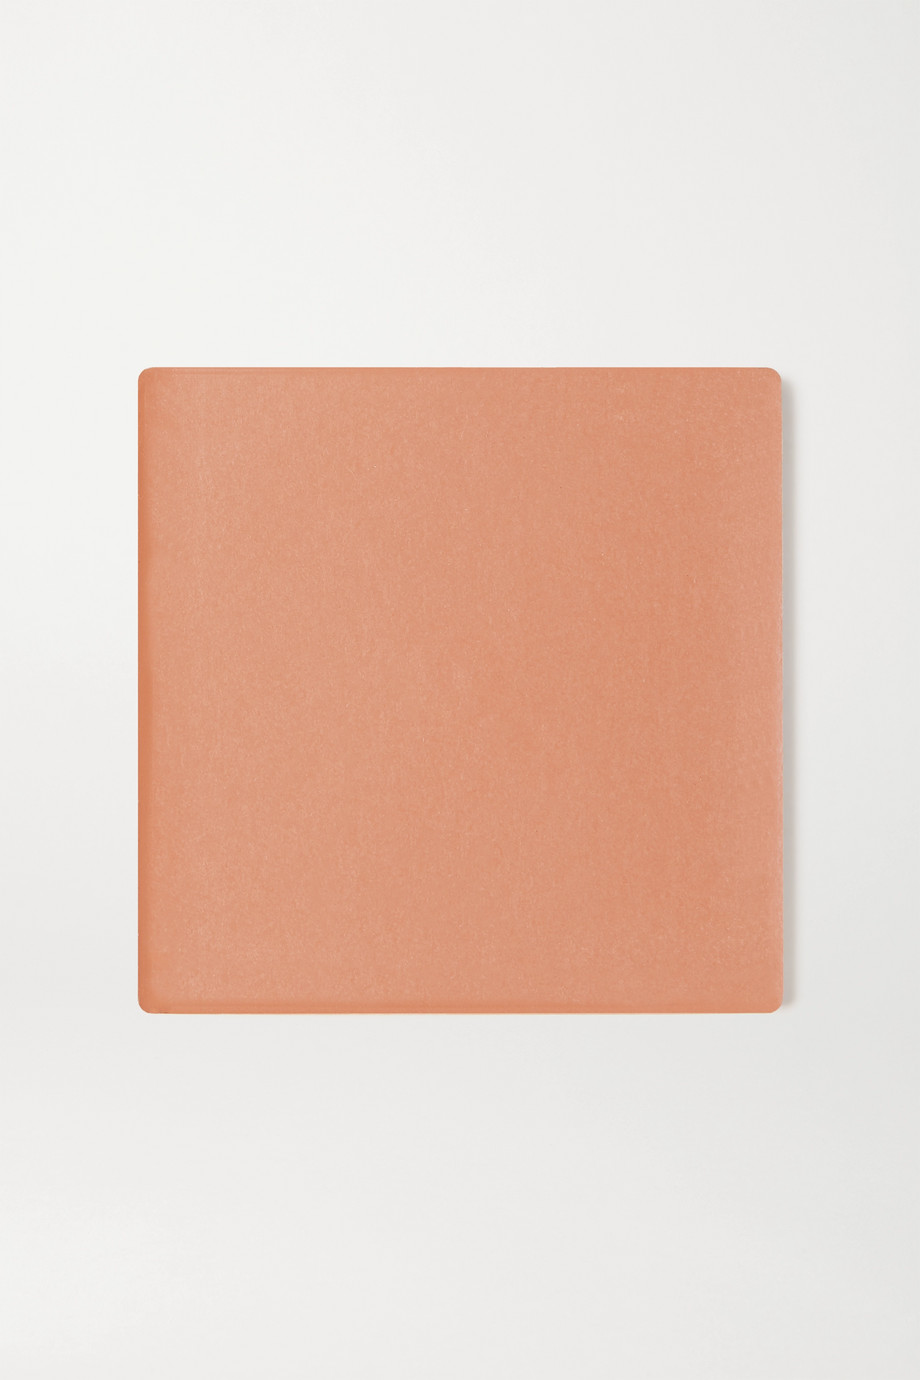 Kjaer Weis Cream Foundation Refill - Transparent